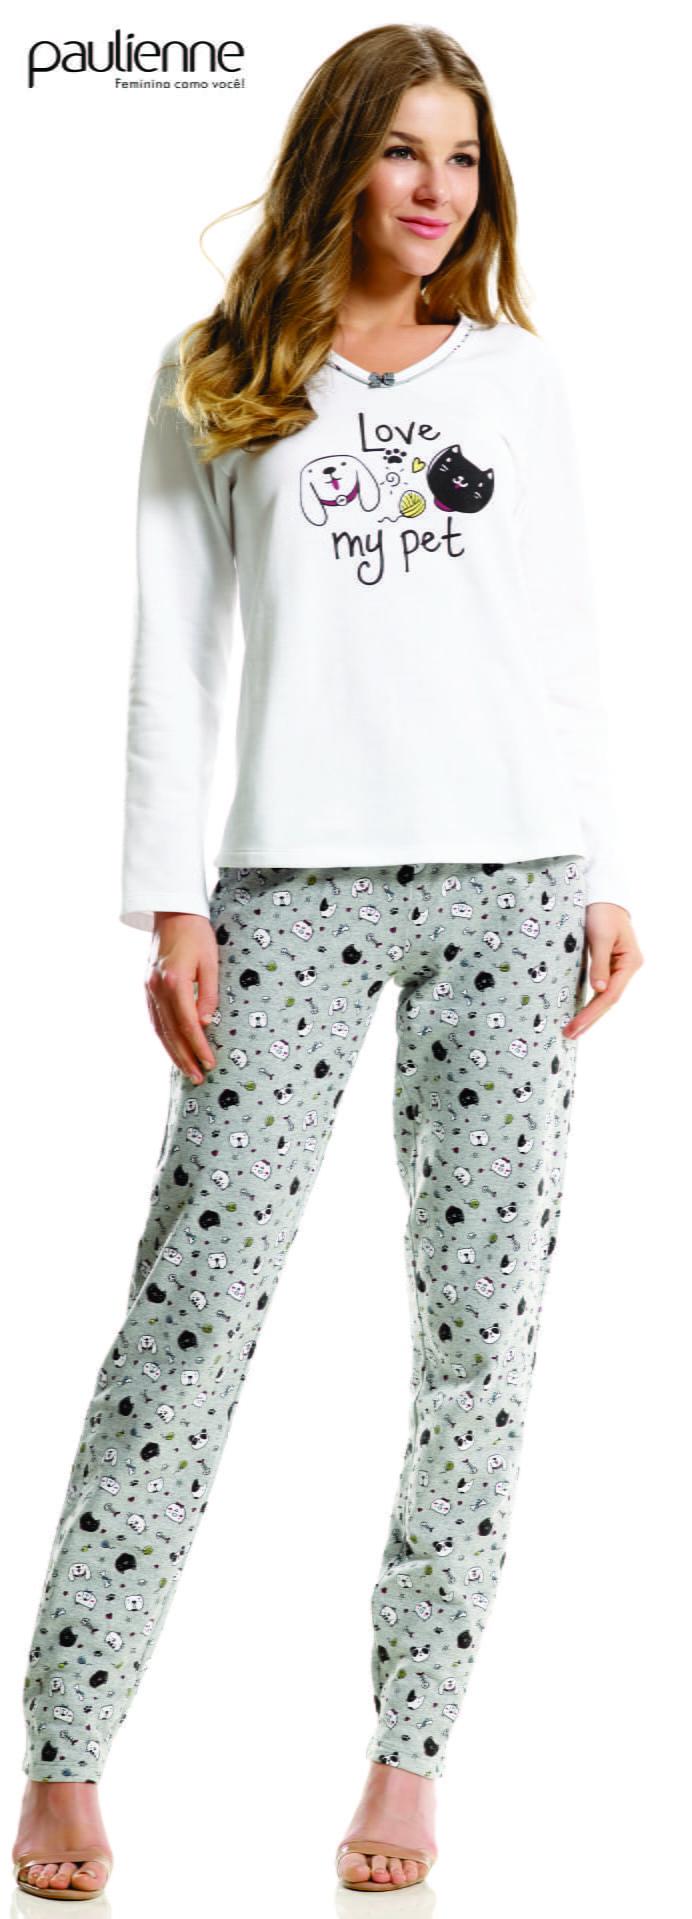 Pijama Feminino Adulto Longo Paulienne Moletom Flanelado Pet 23262